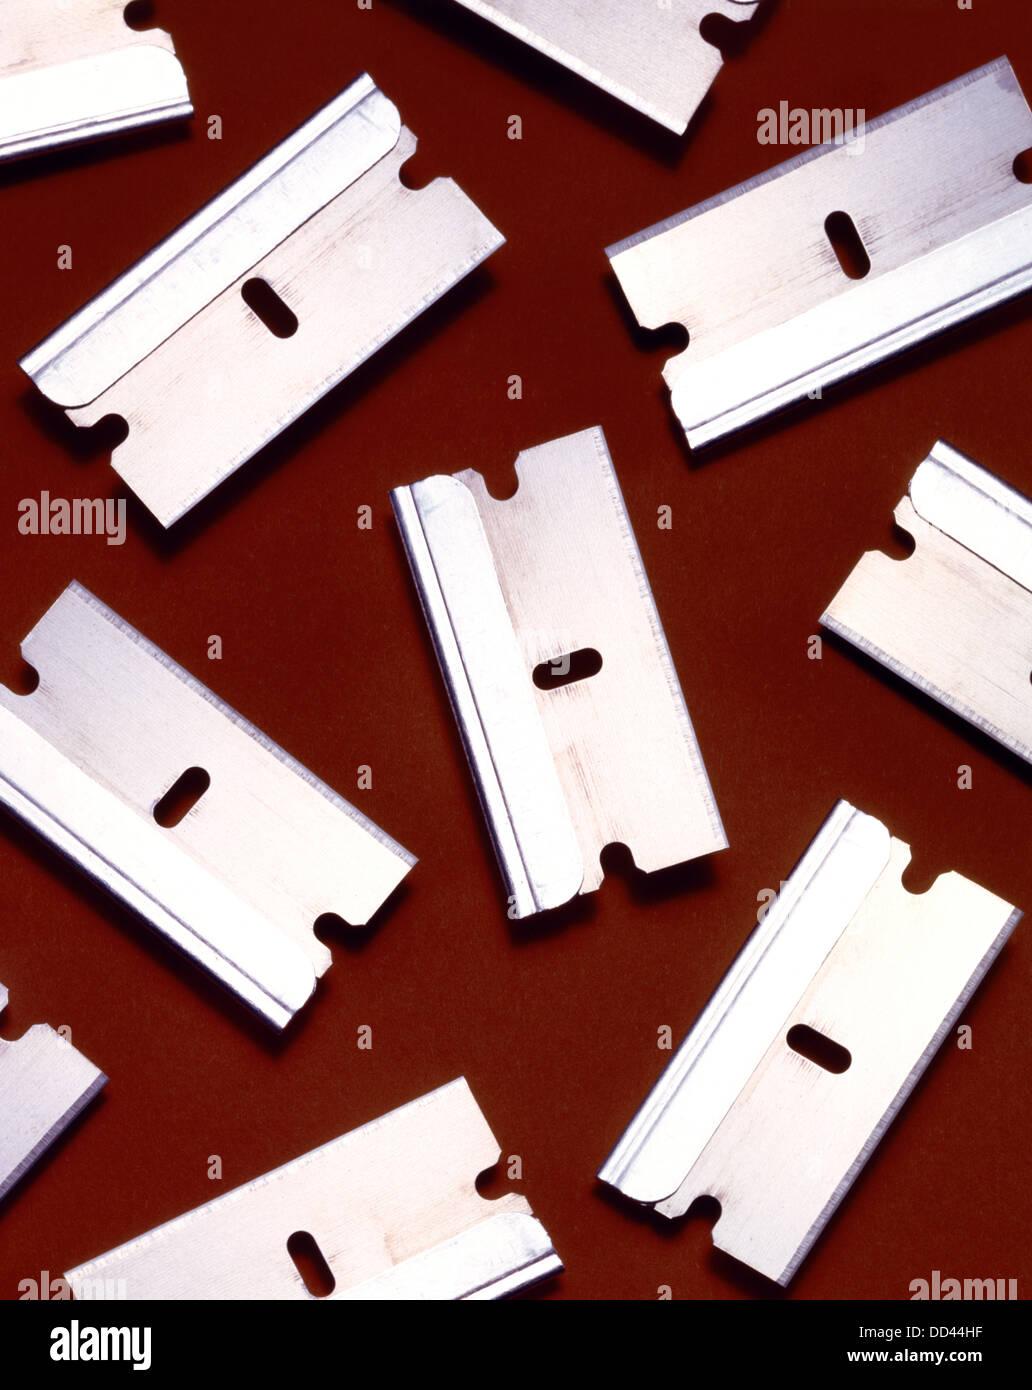 Metal razor blades - Stock Image